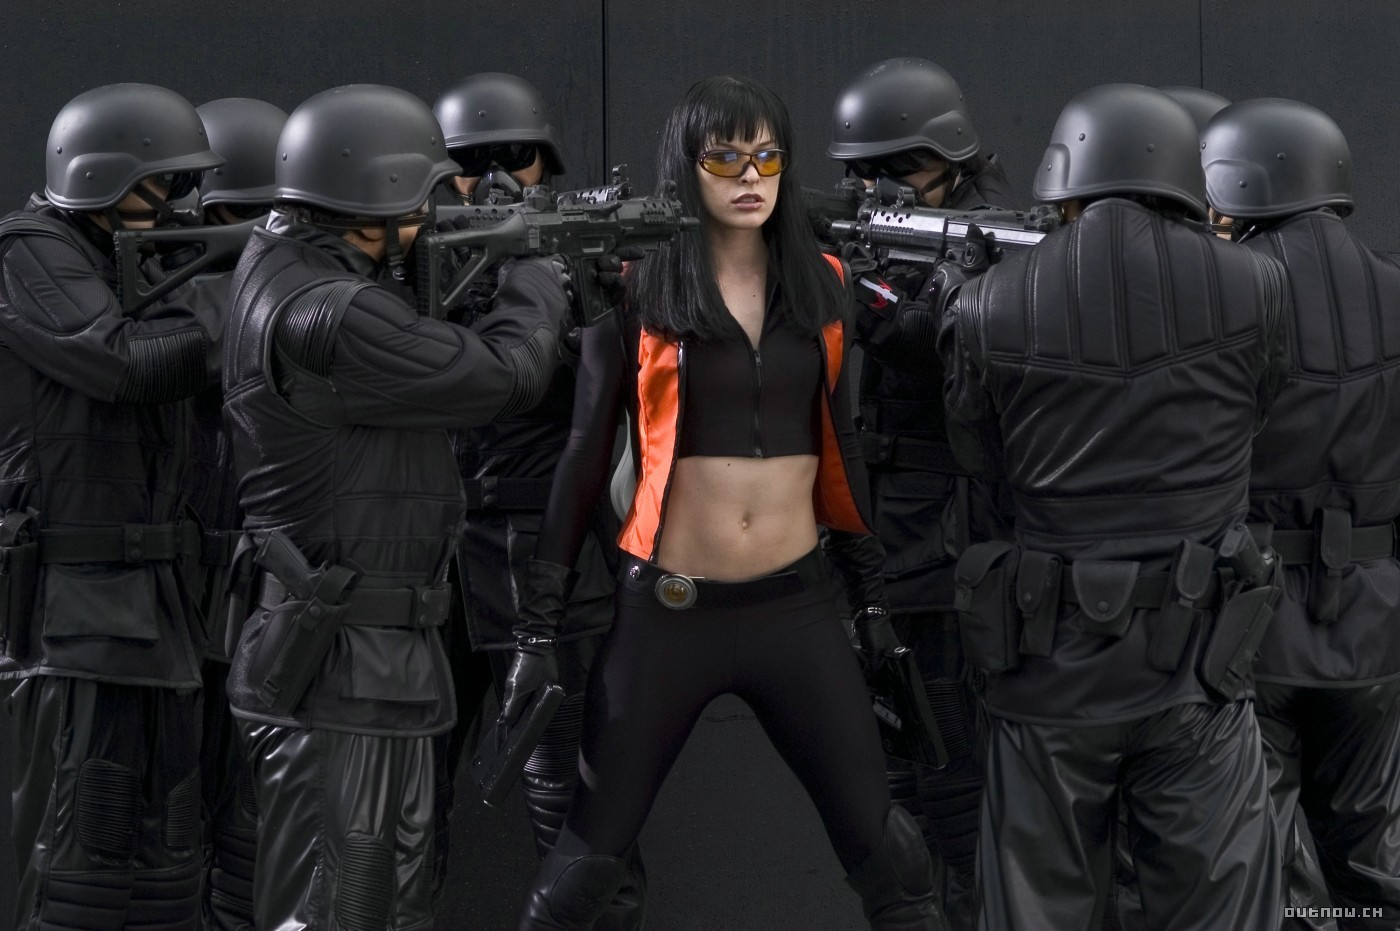 Ultraviolet Movie imag... Milla Jovovich Photo 2006 Fanpop